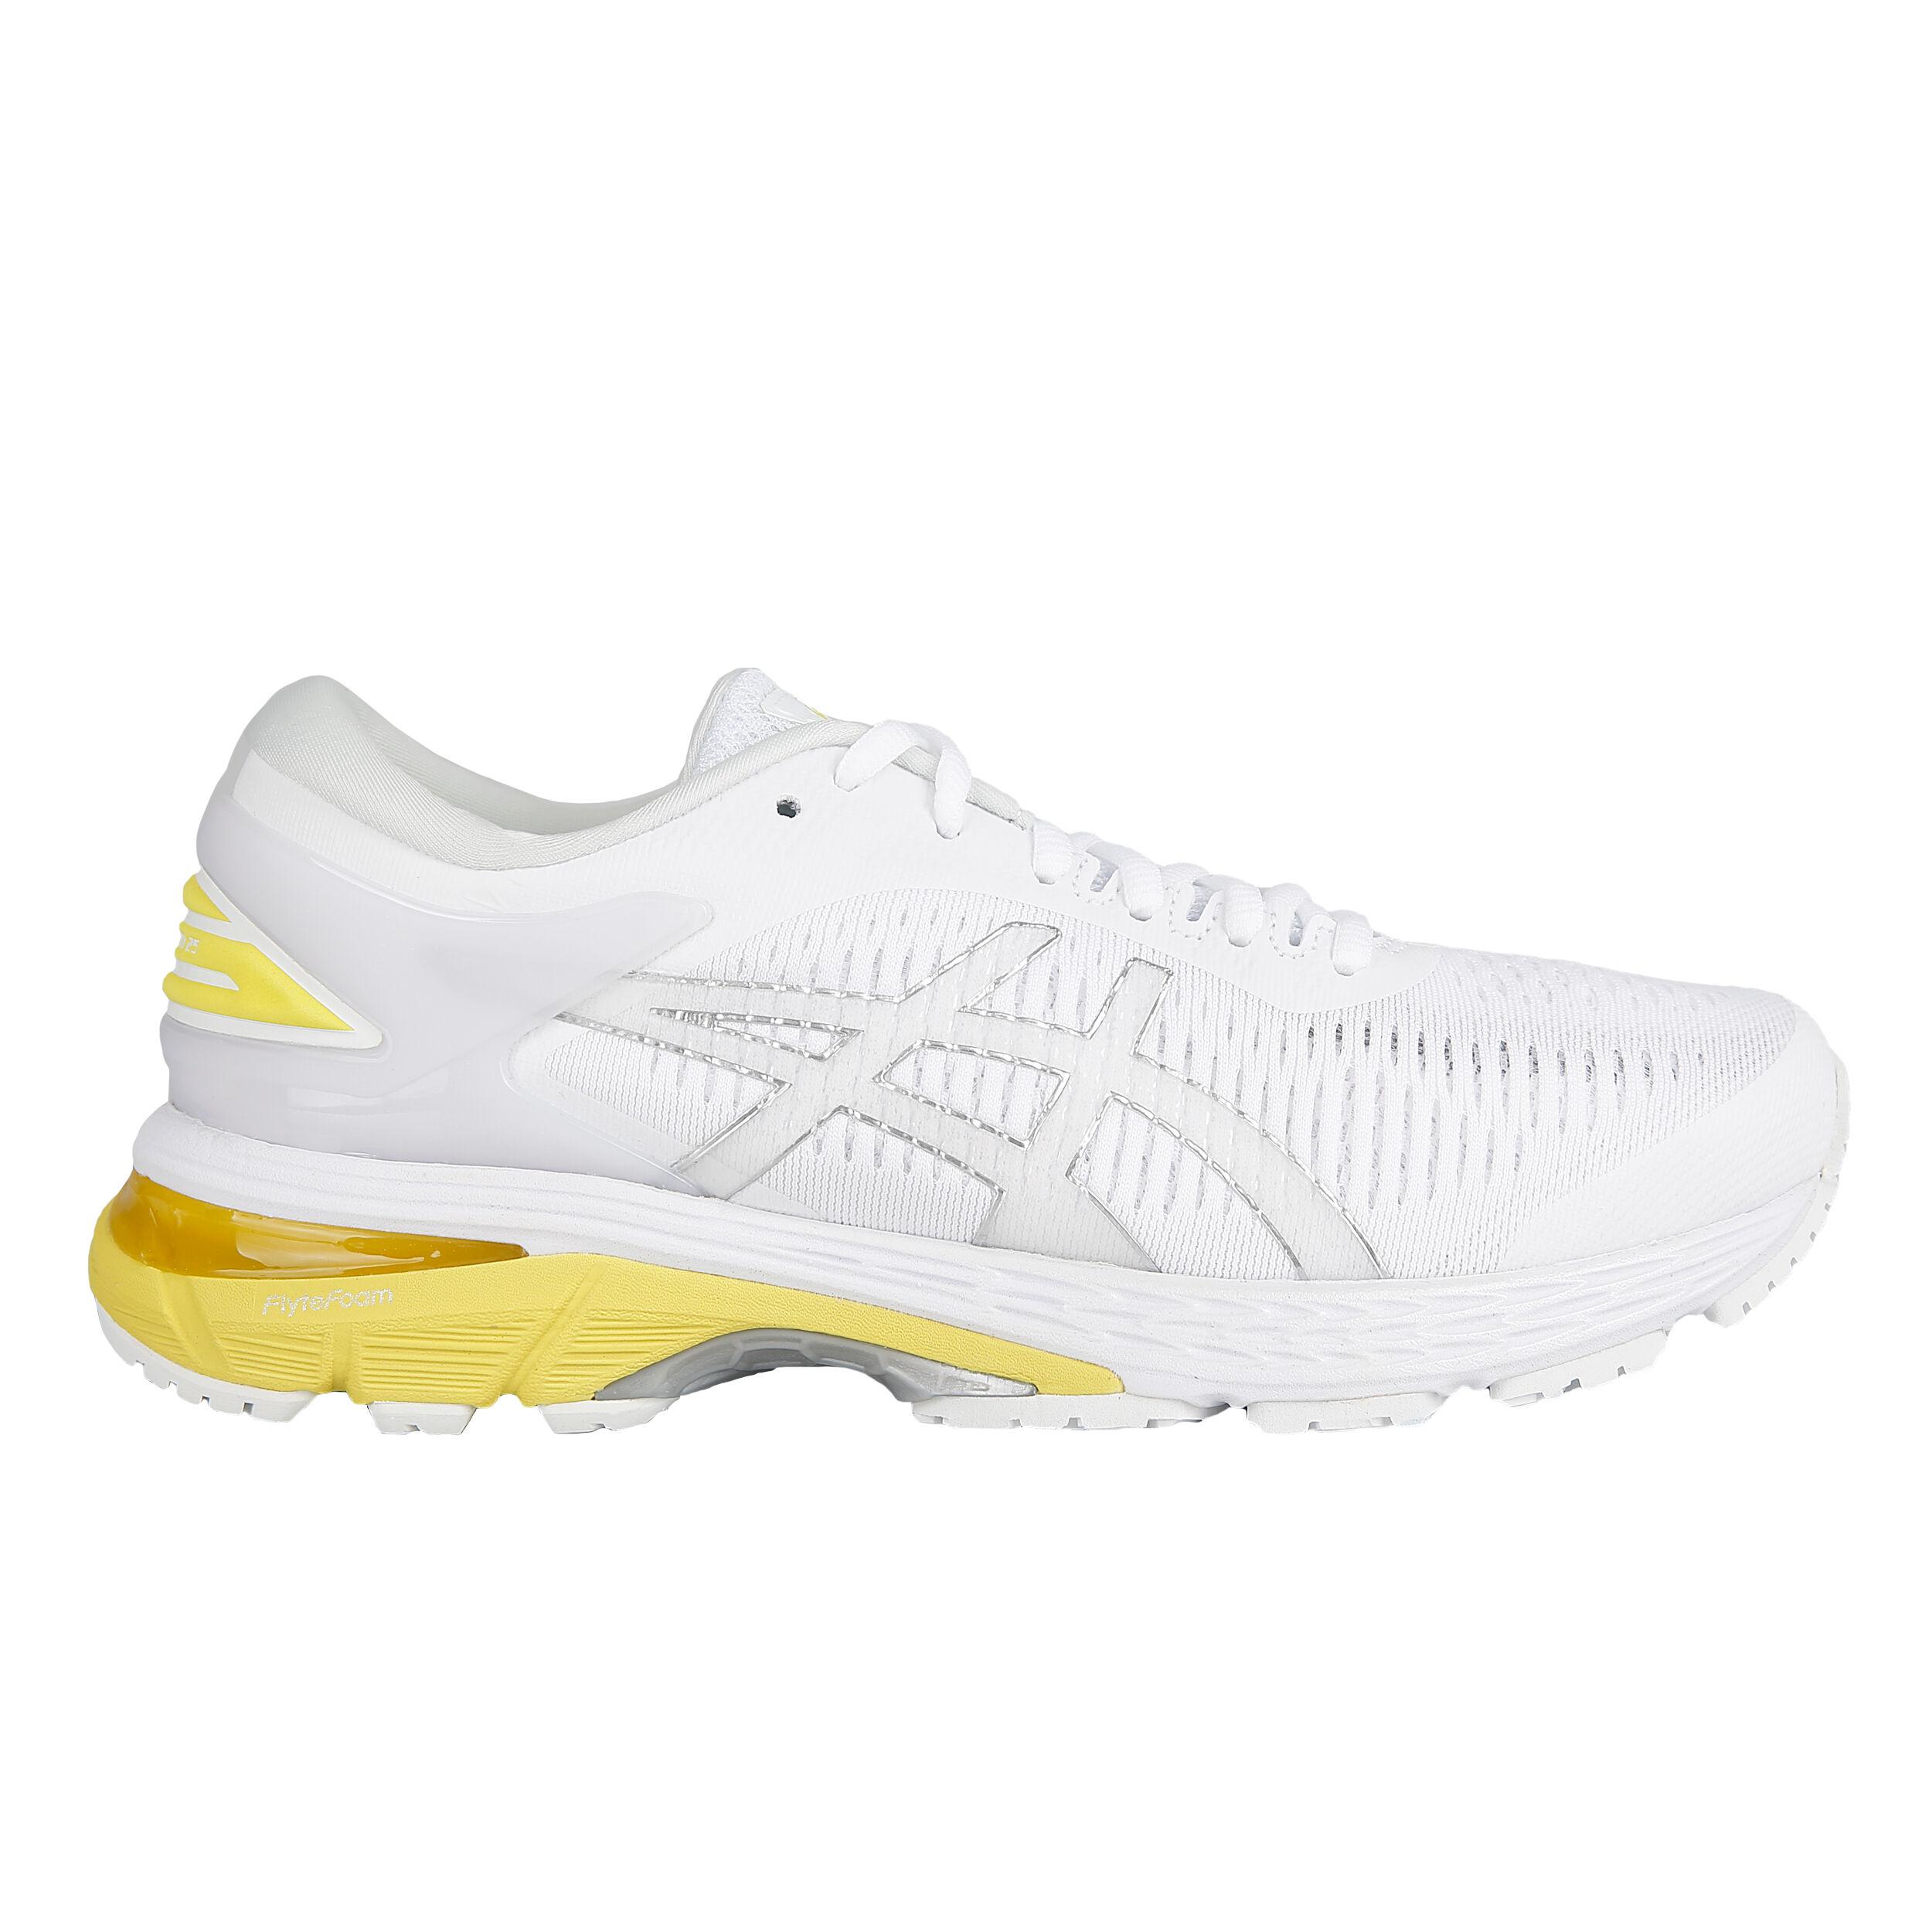 buy Asics Gel-Kayano 25 Stability Running Shoe Women - White ...